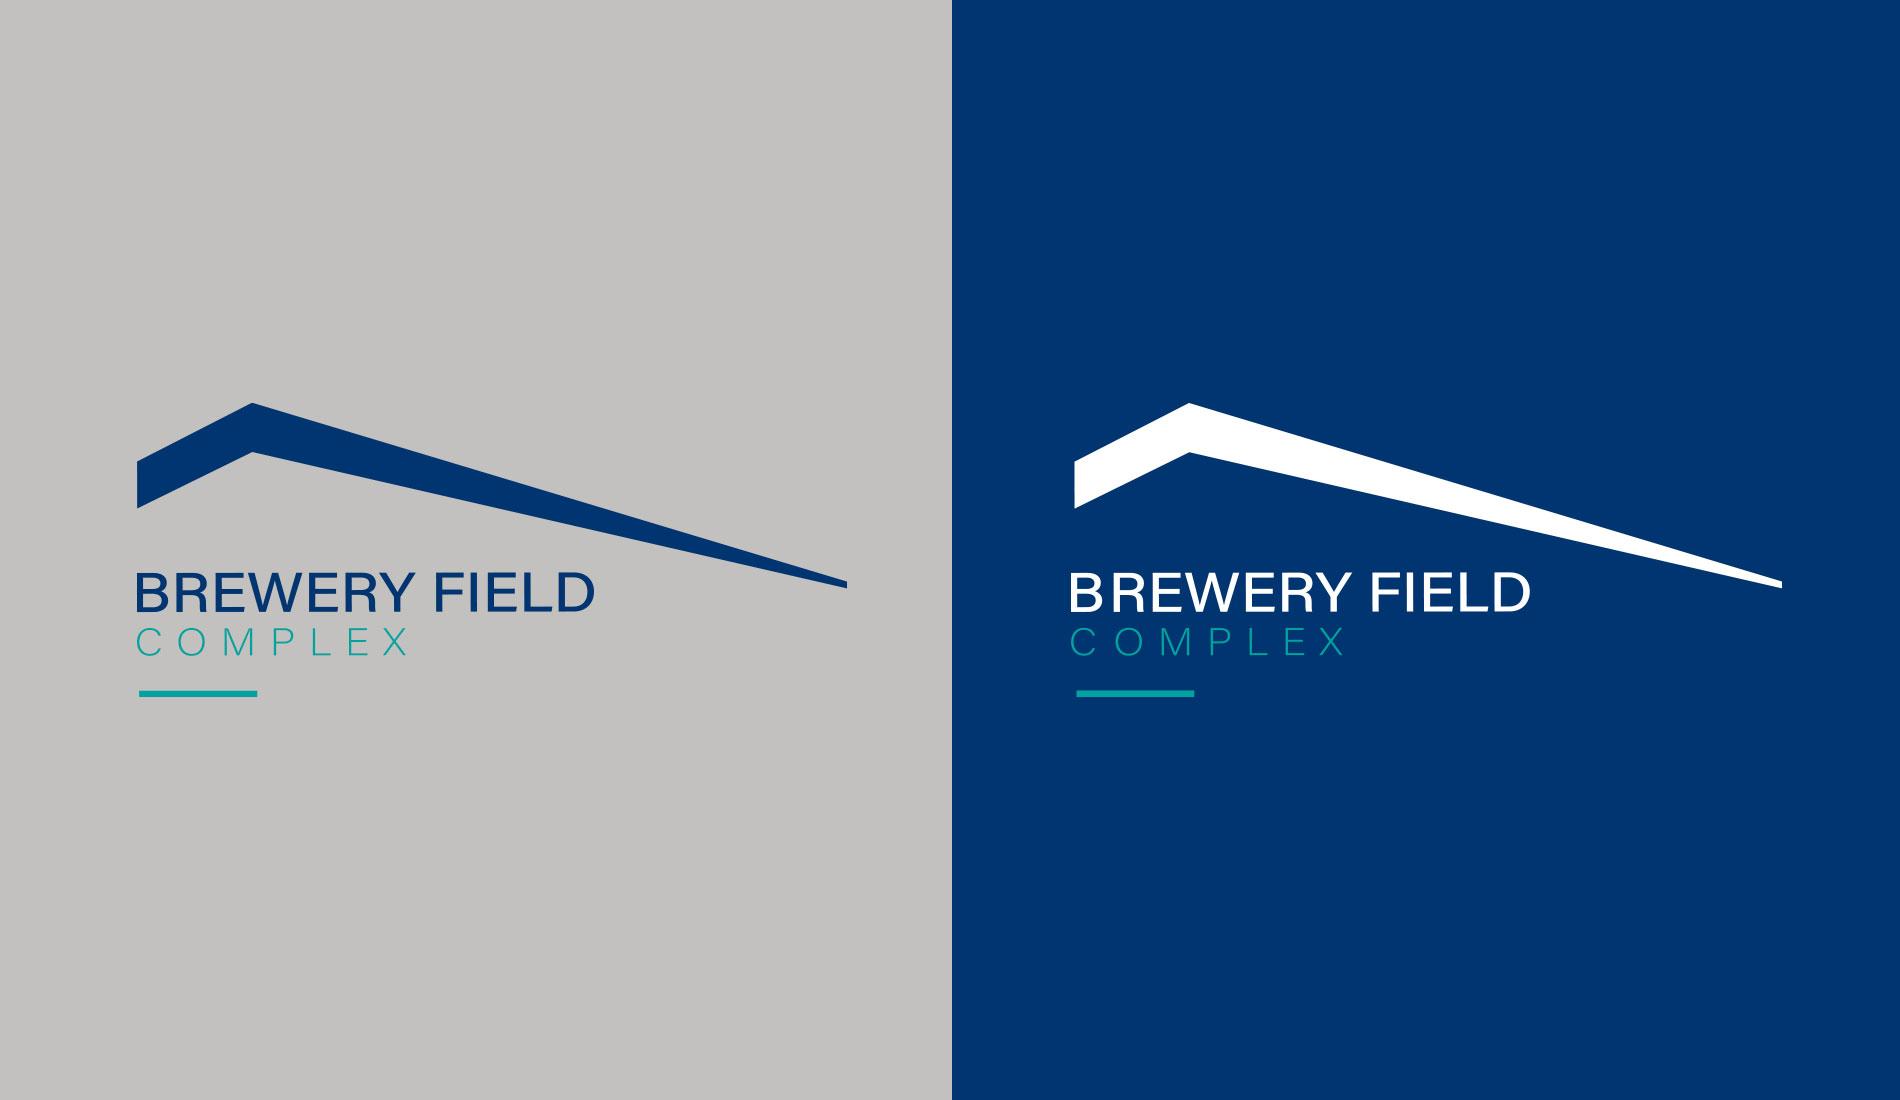 Brewery Field Complex